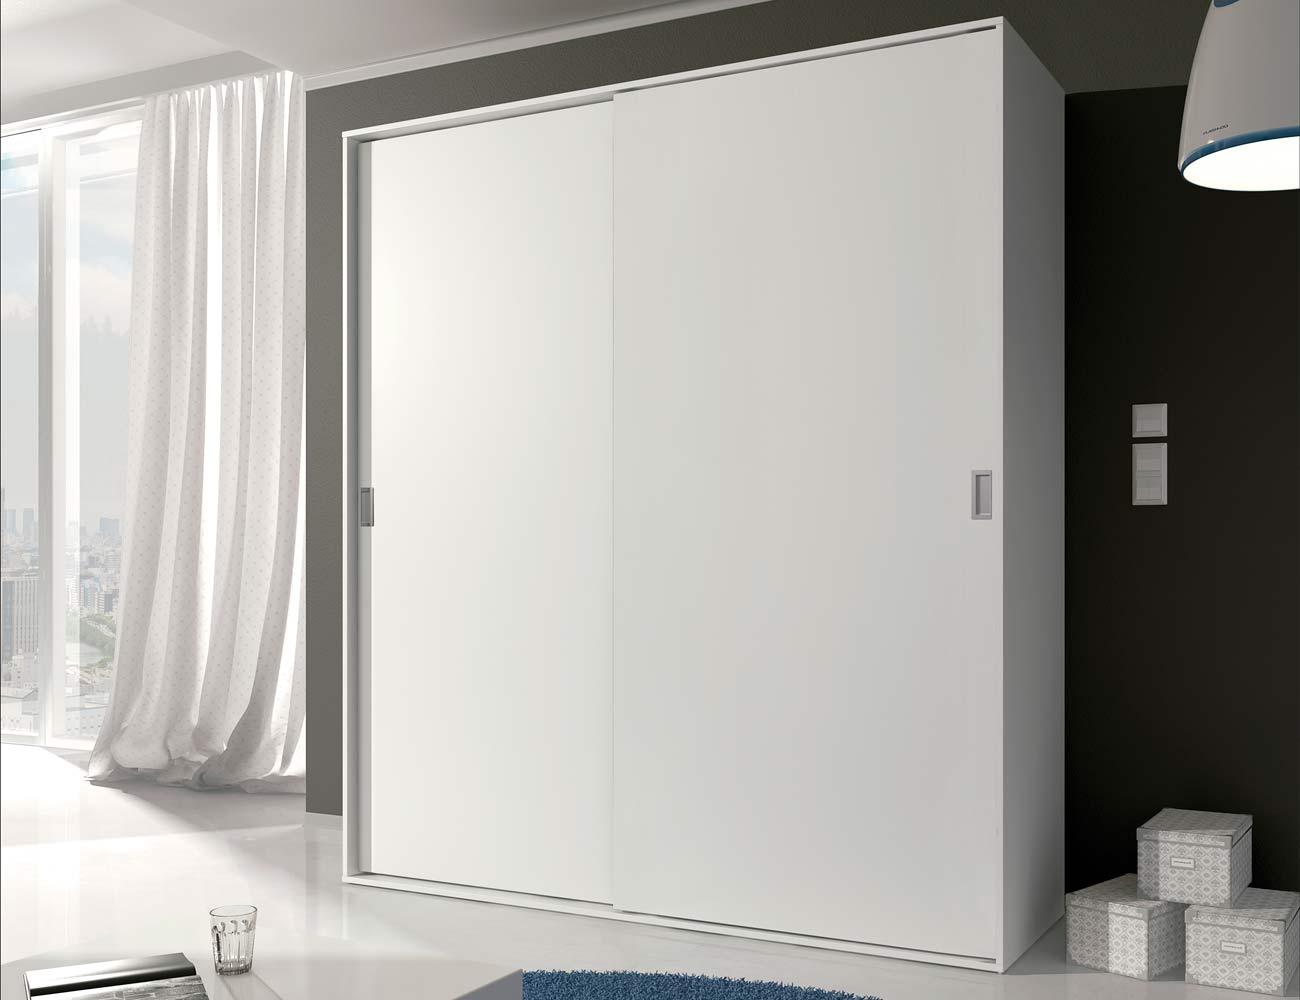 Dormitorio de matrimonio moderno cabecero con luces leds - Armario dormitorio blanco ...